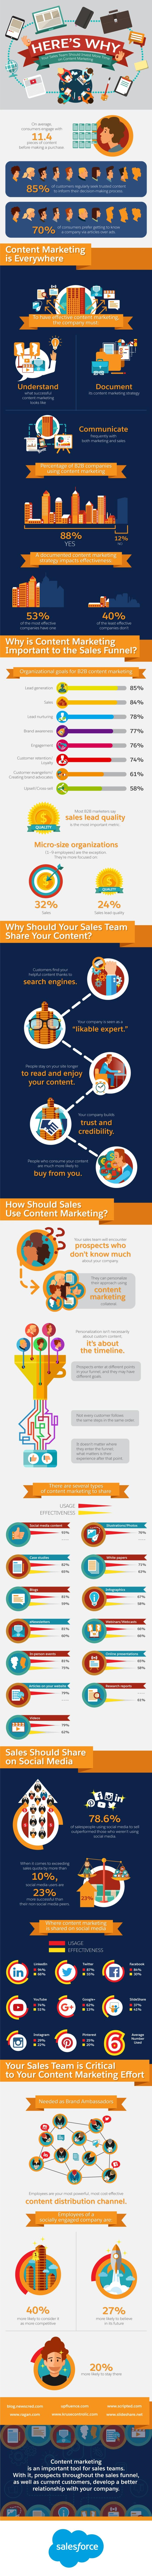 content-marketing-final